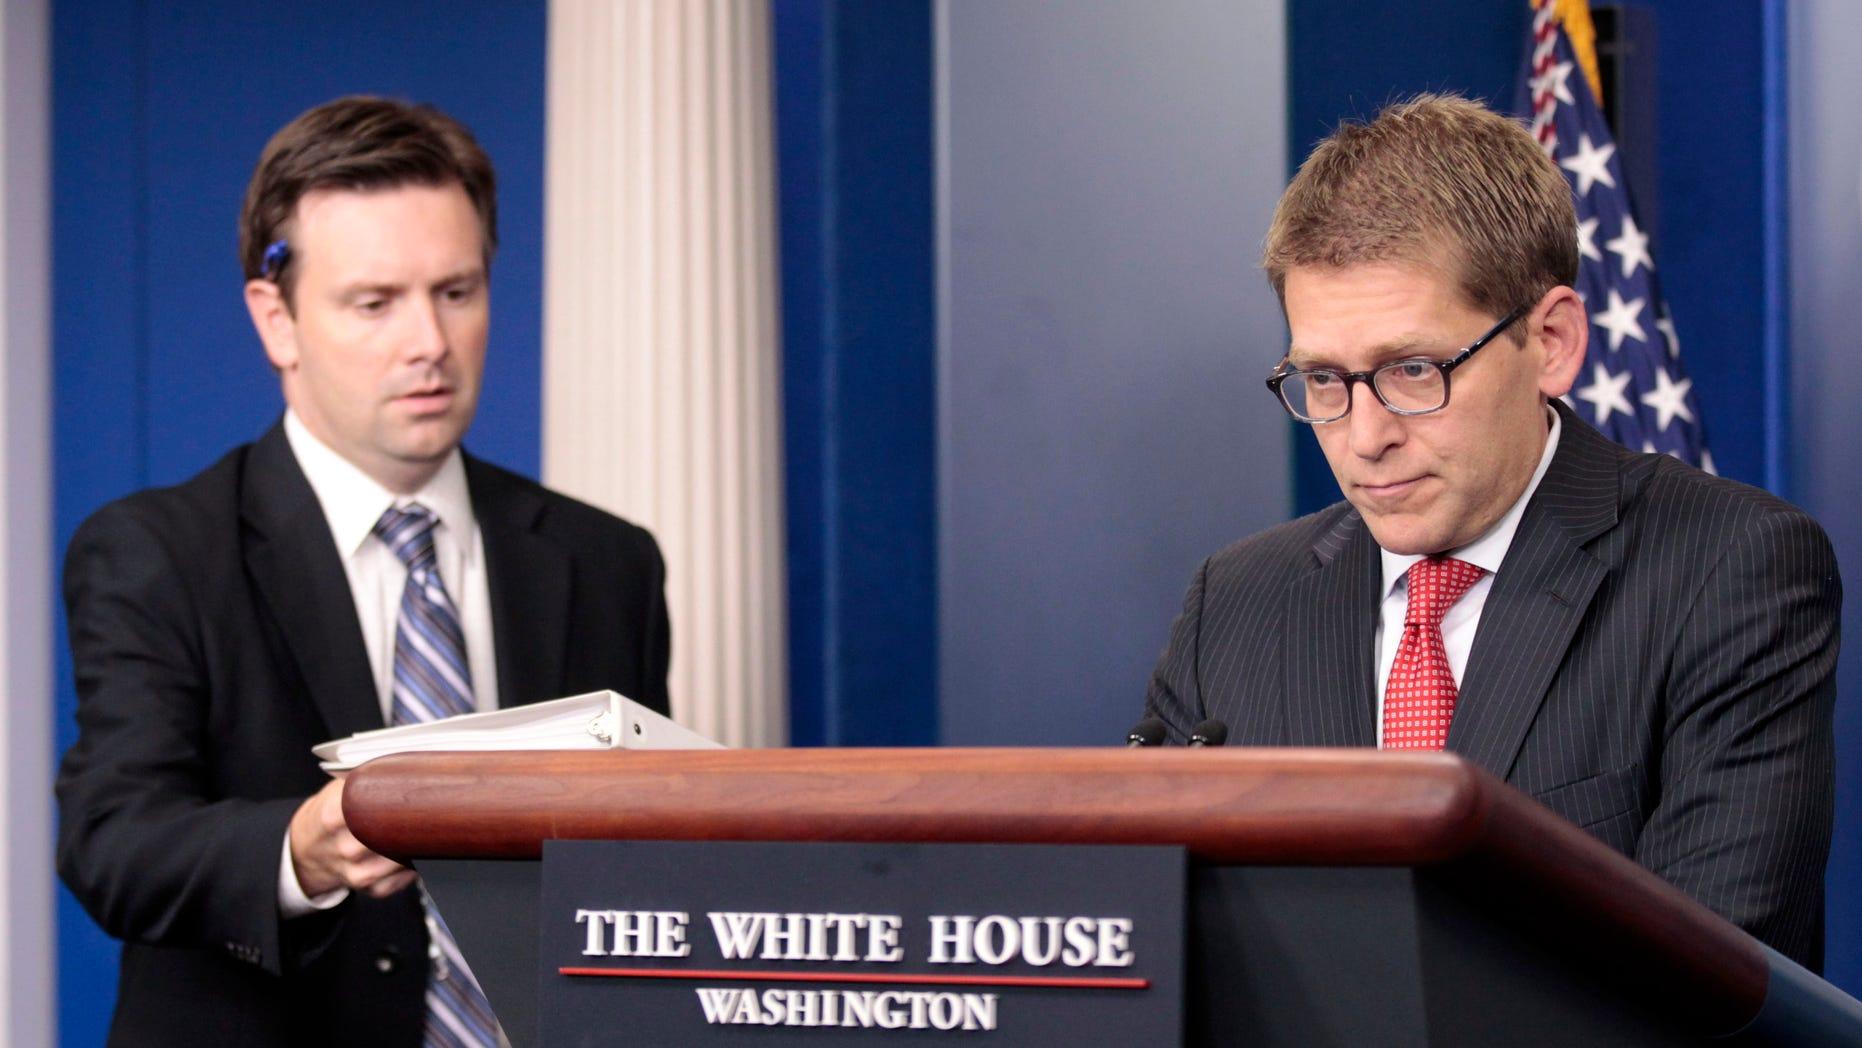 Wednesday: Principal Deputy Press Secretary Josh Earnest, left, hands off the briefing book to White House Press Secretary Jay Carney during the daily news briefing at the White House.